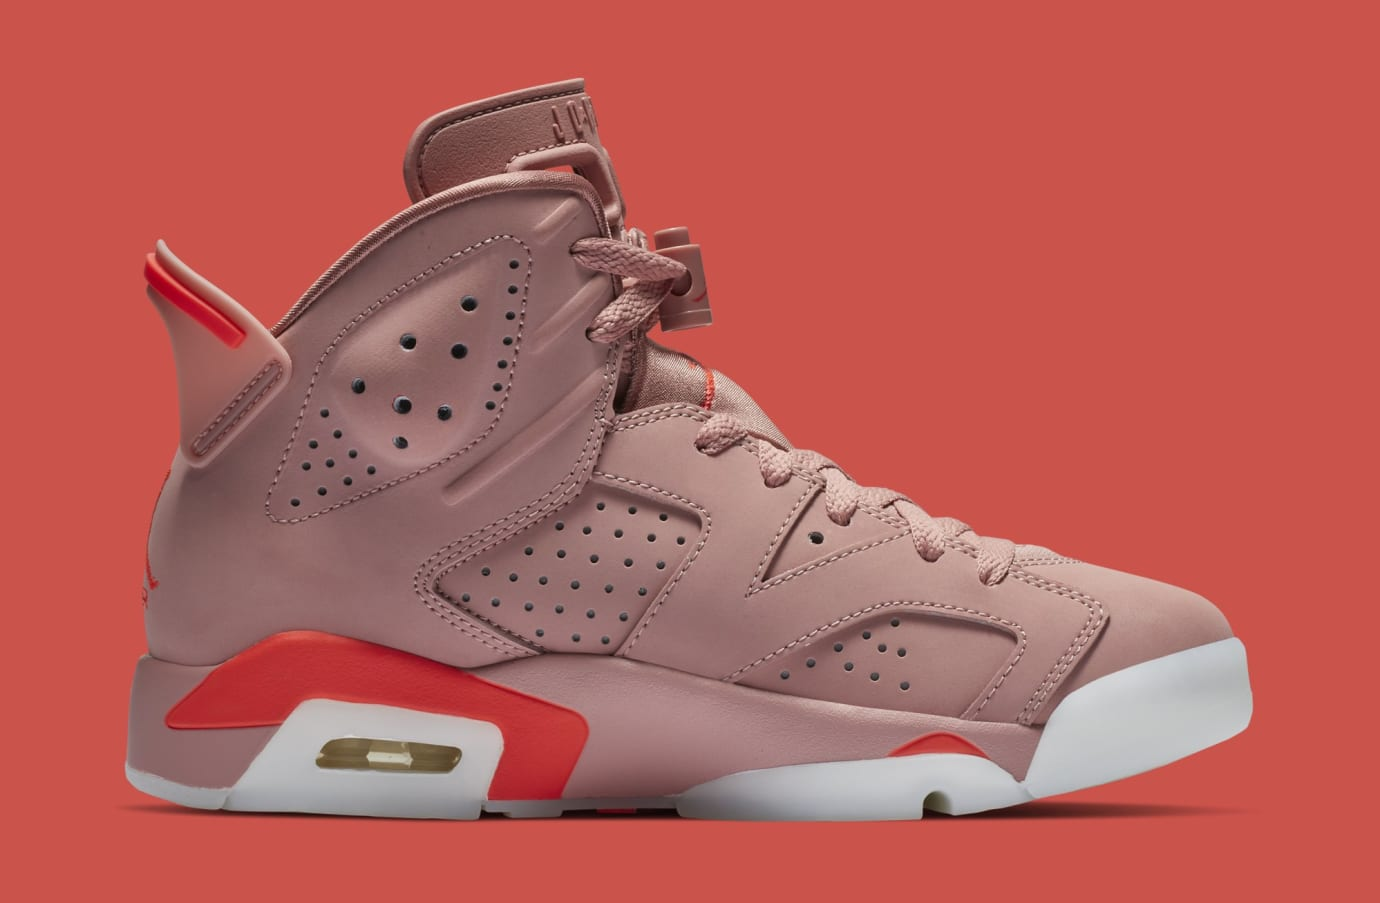 Image via Nike Aleali May x Air Jordan 6  Rust Pink Bright Crimson   CI0550-600 5bedd0282d